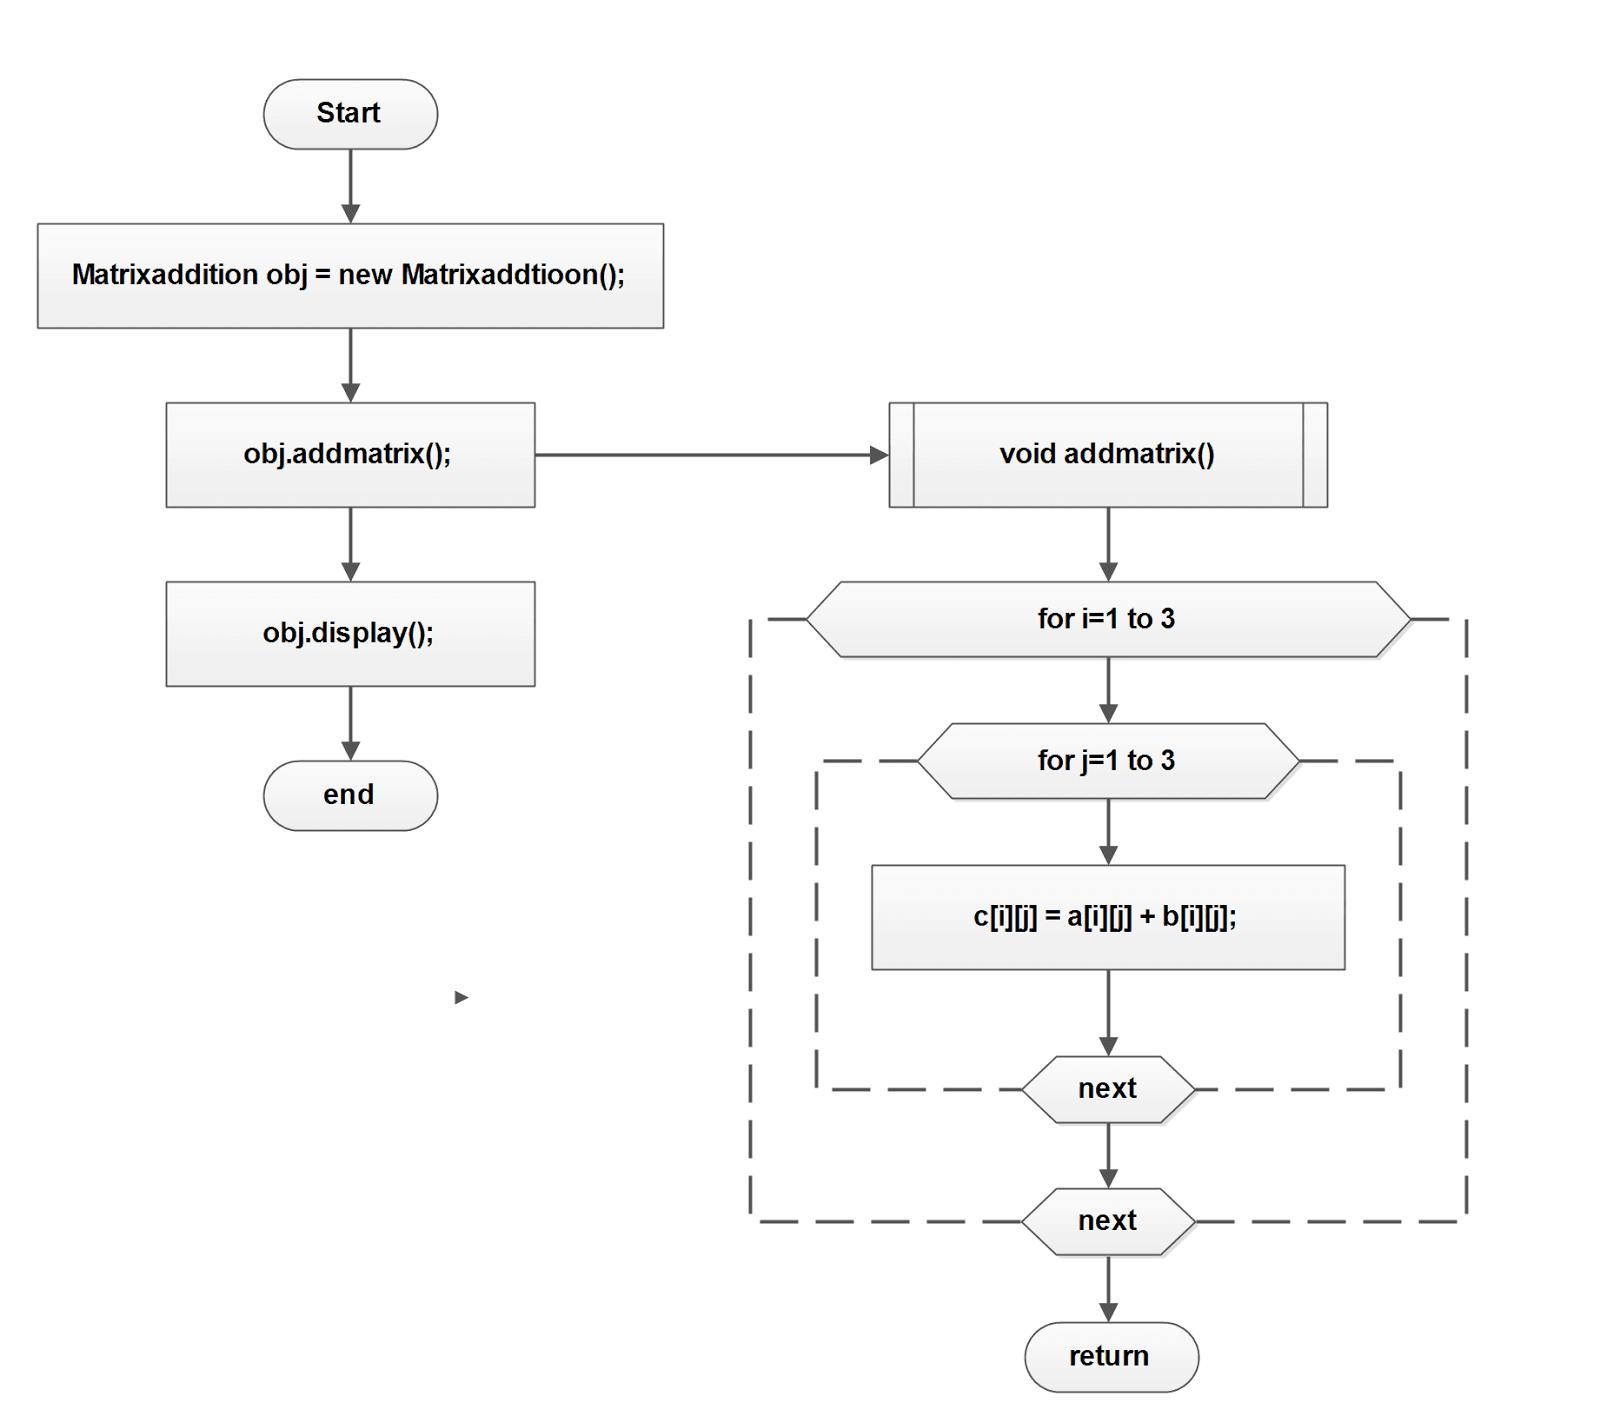 c programming flowchart example interactive chart maker flowchart2b 2bmatrixaddition page 1 min c - Flowchart C